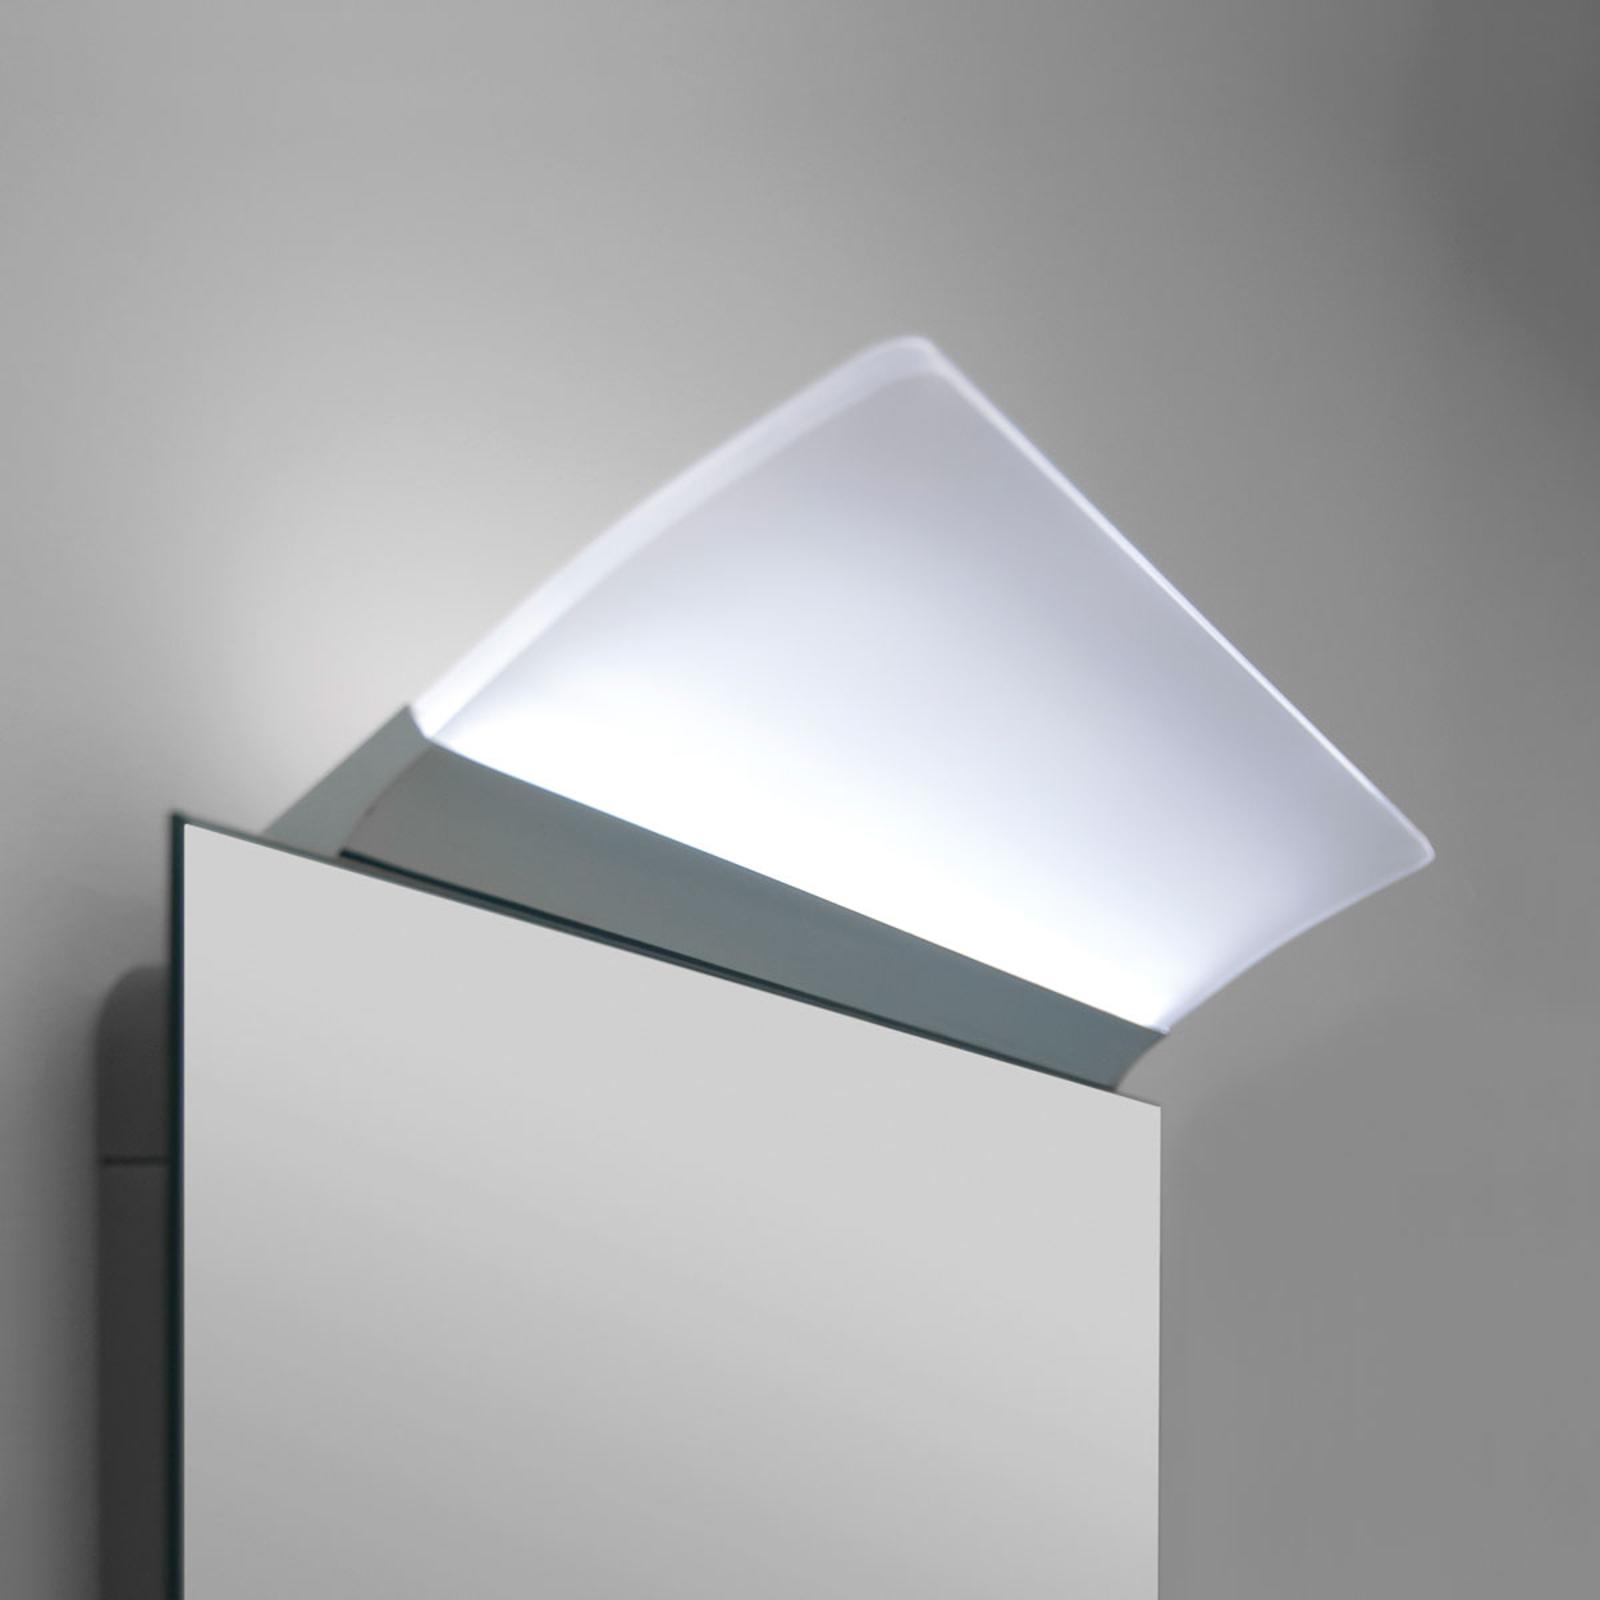 Oświetlenie lustra LED Angela IP44 30 cm